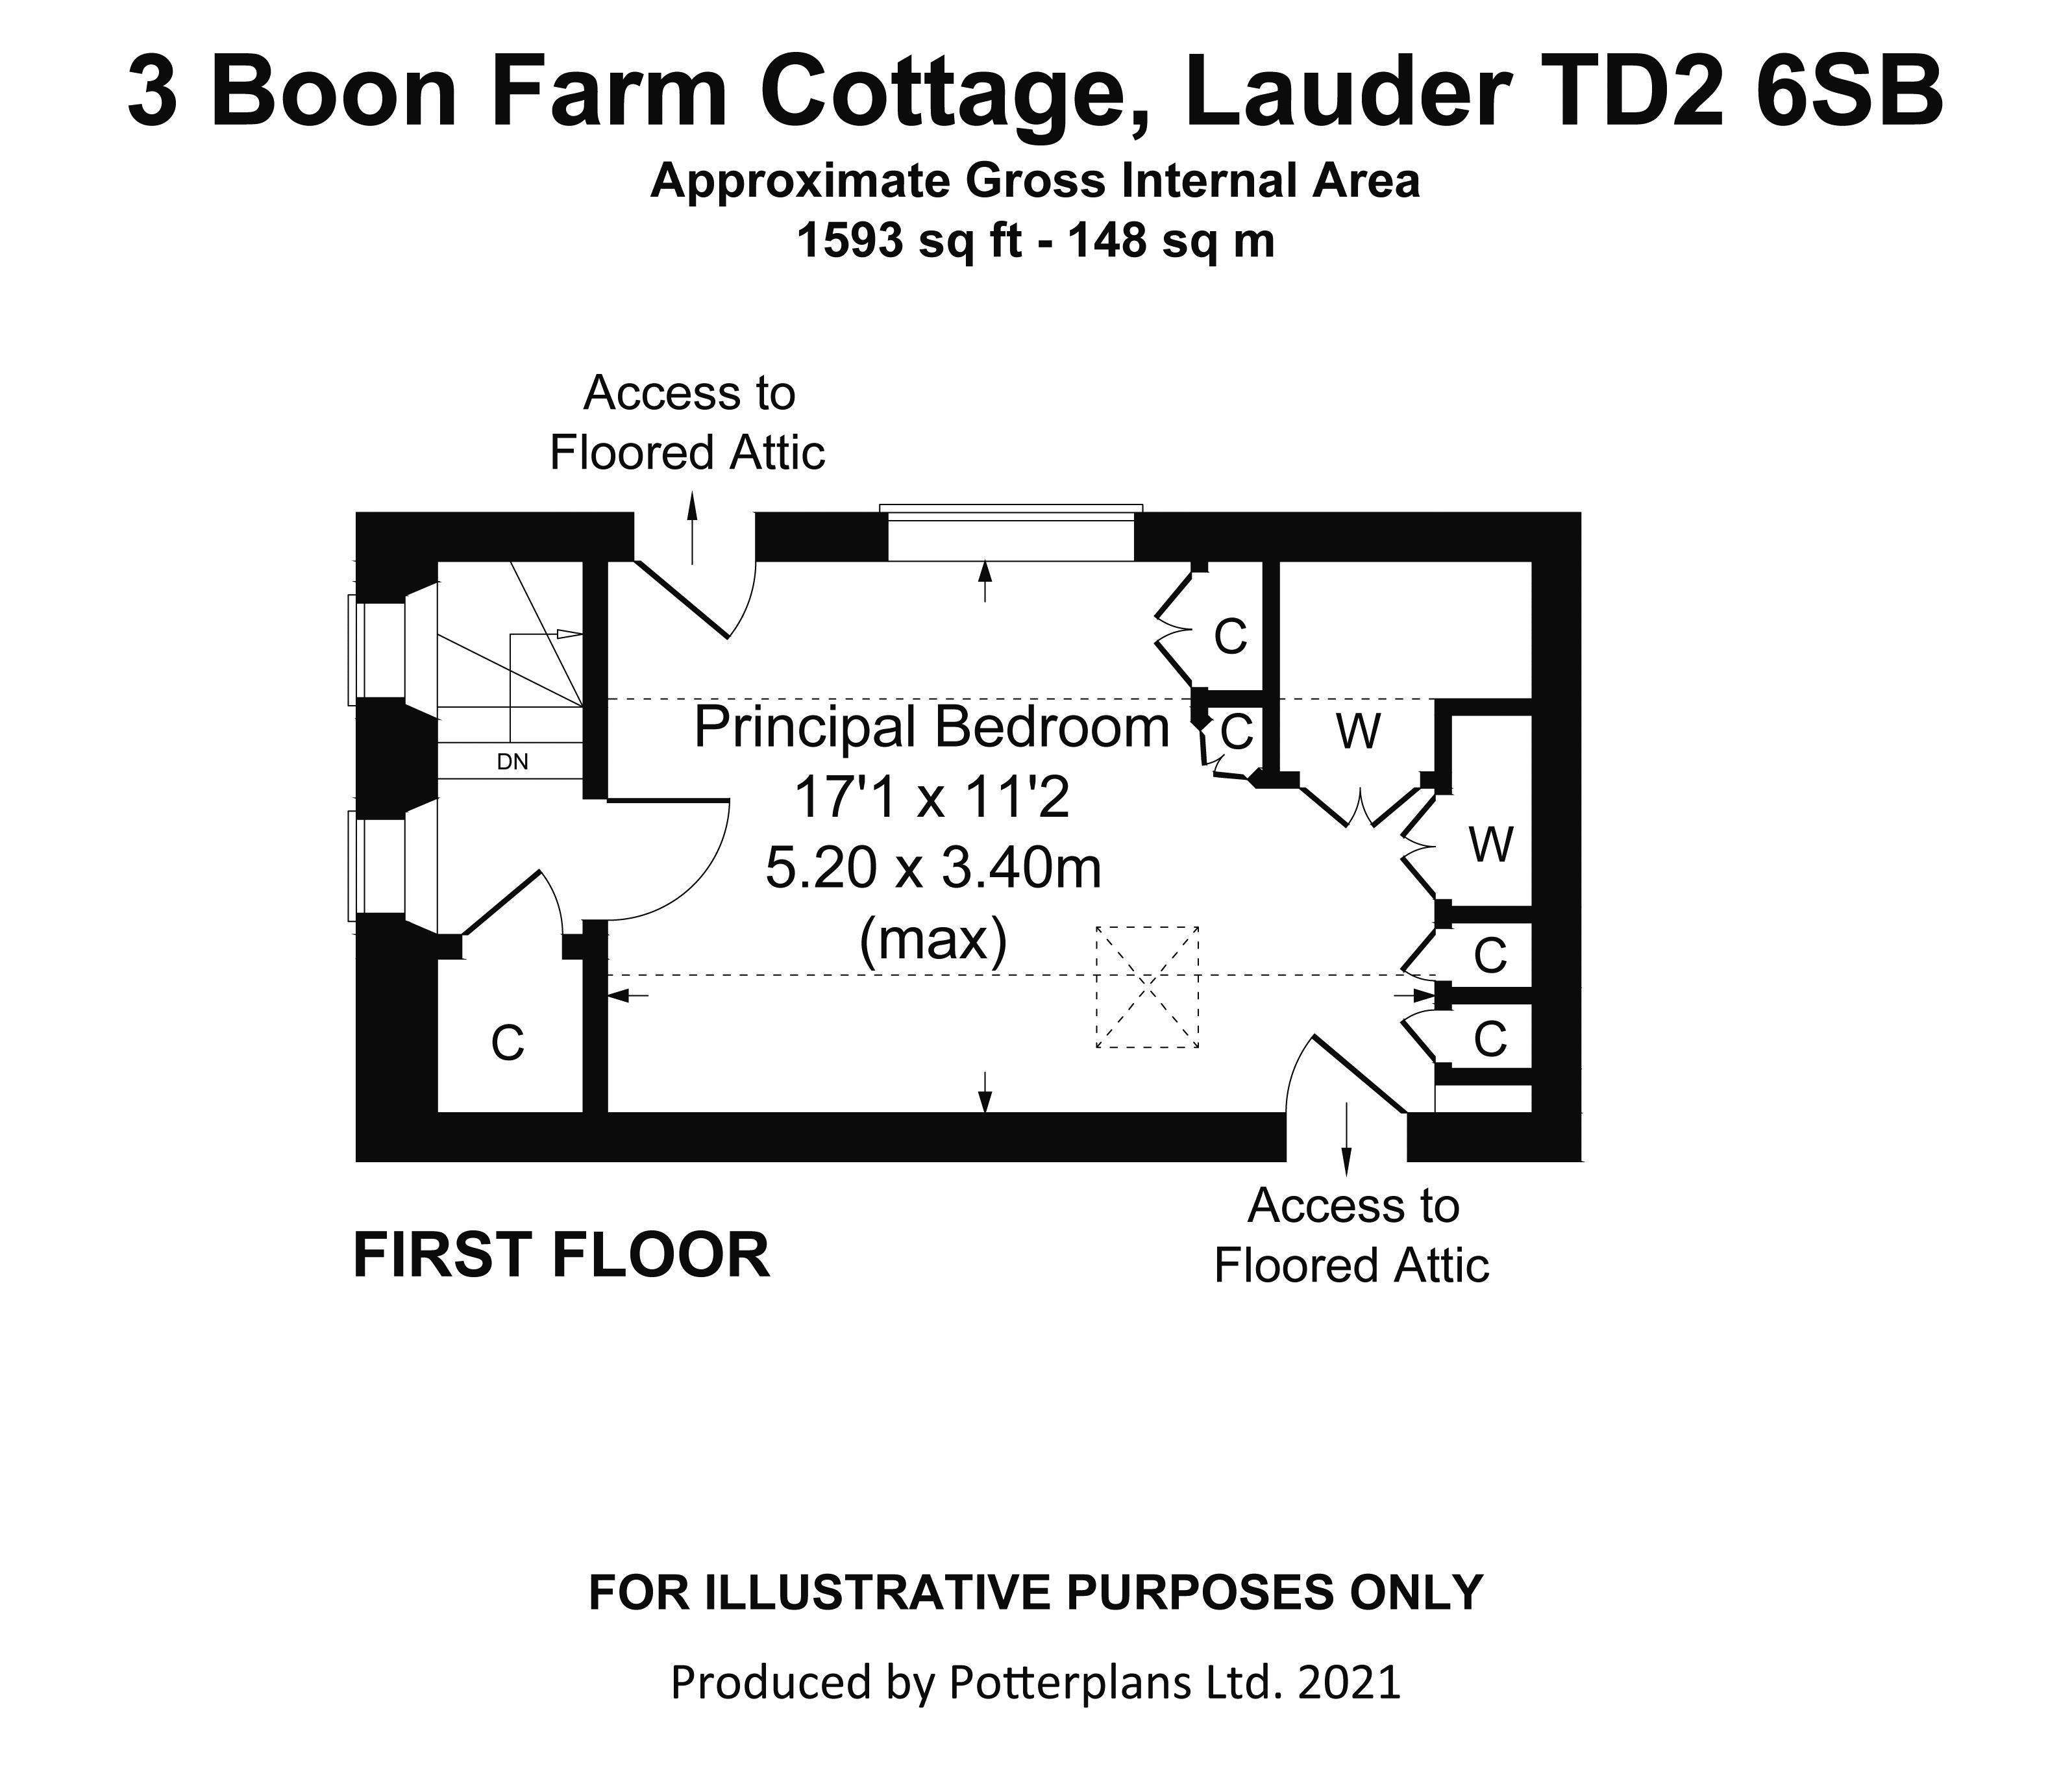 3 Boon Farm Cottage First Floor